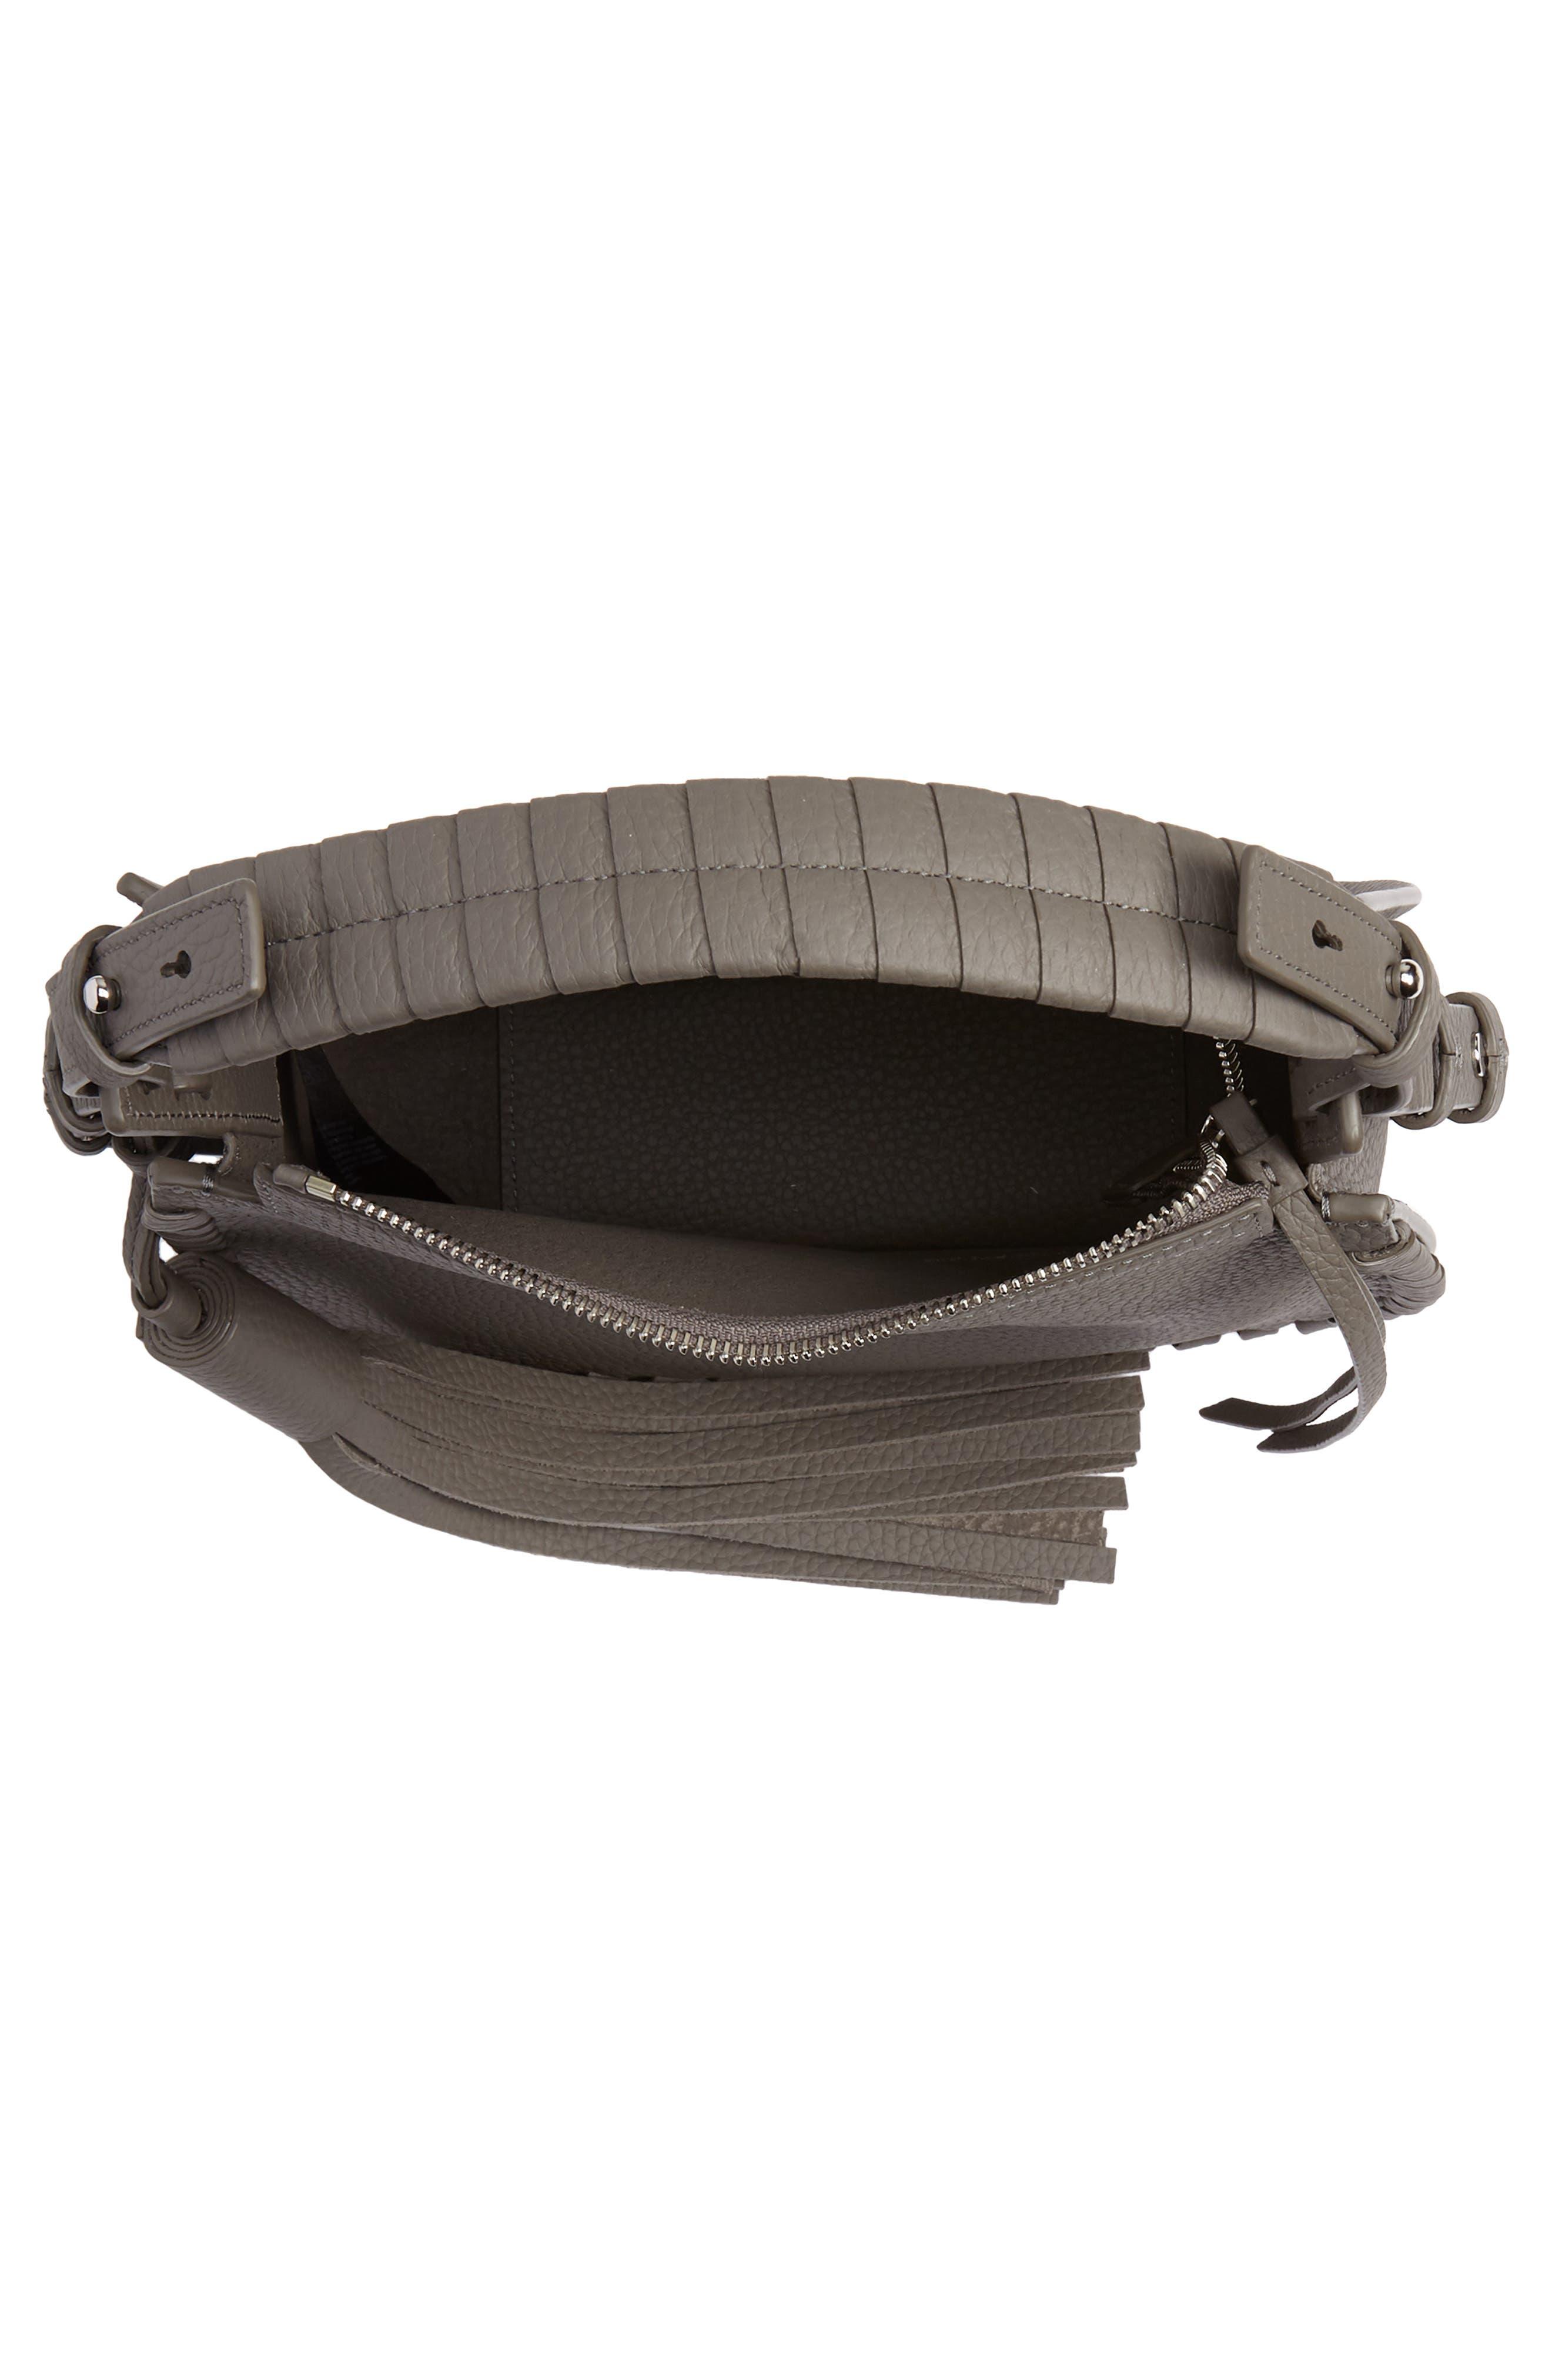 Mori Leather Crossbody Bag,                             Alternate thumbnail 4, color,                             STORM GREY